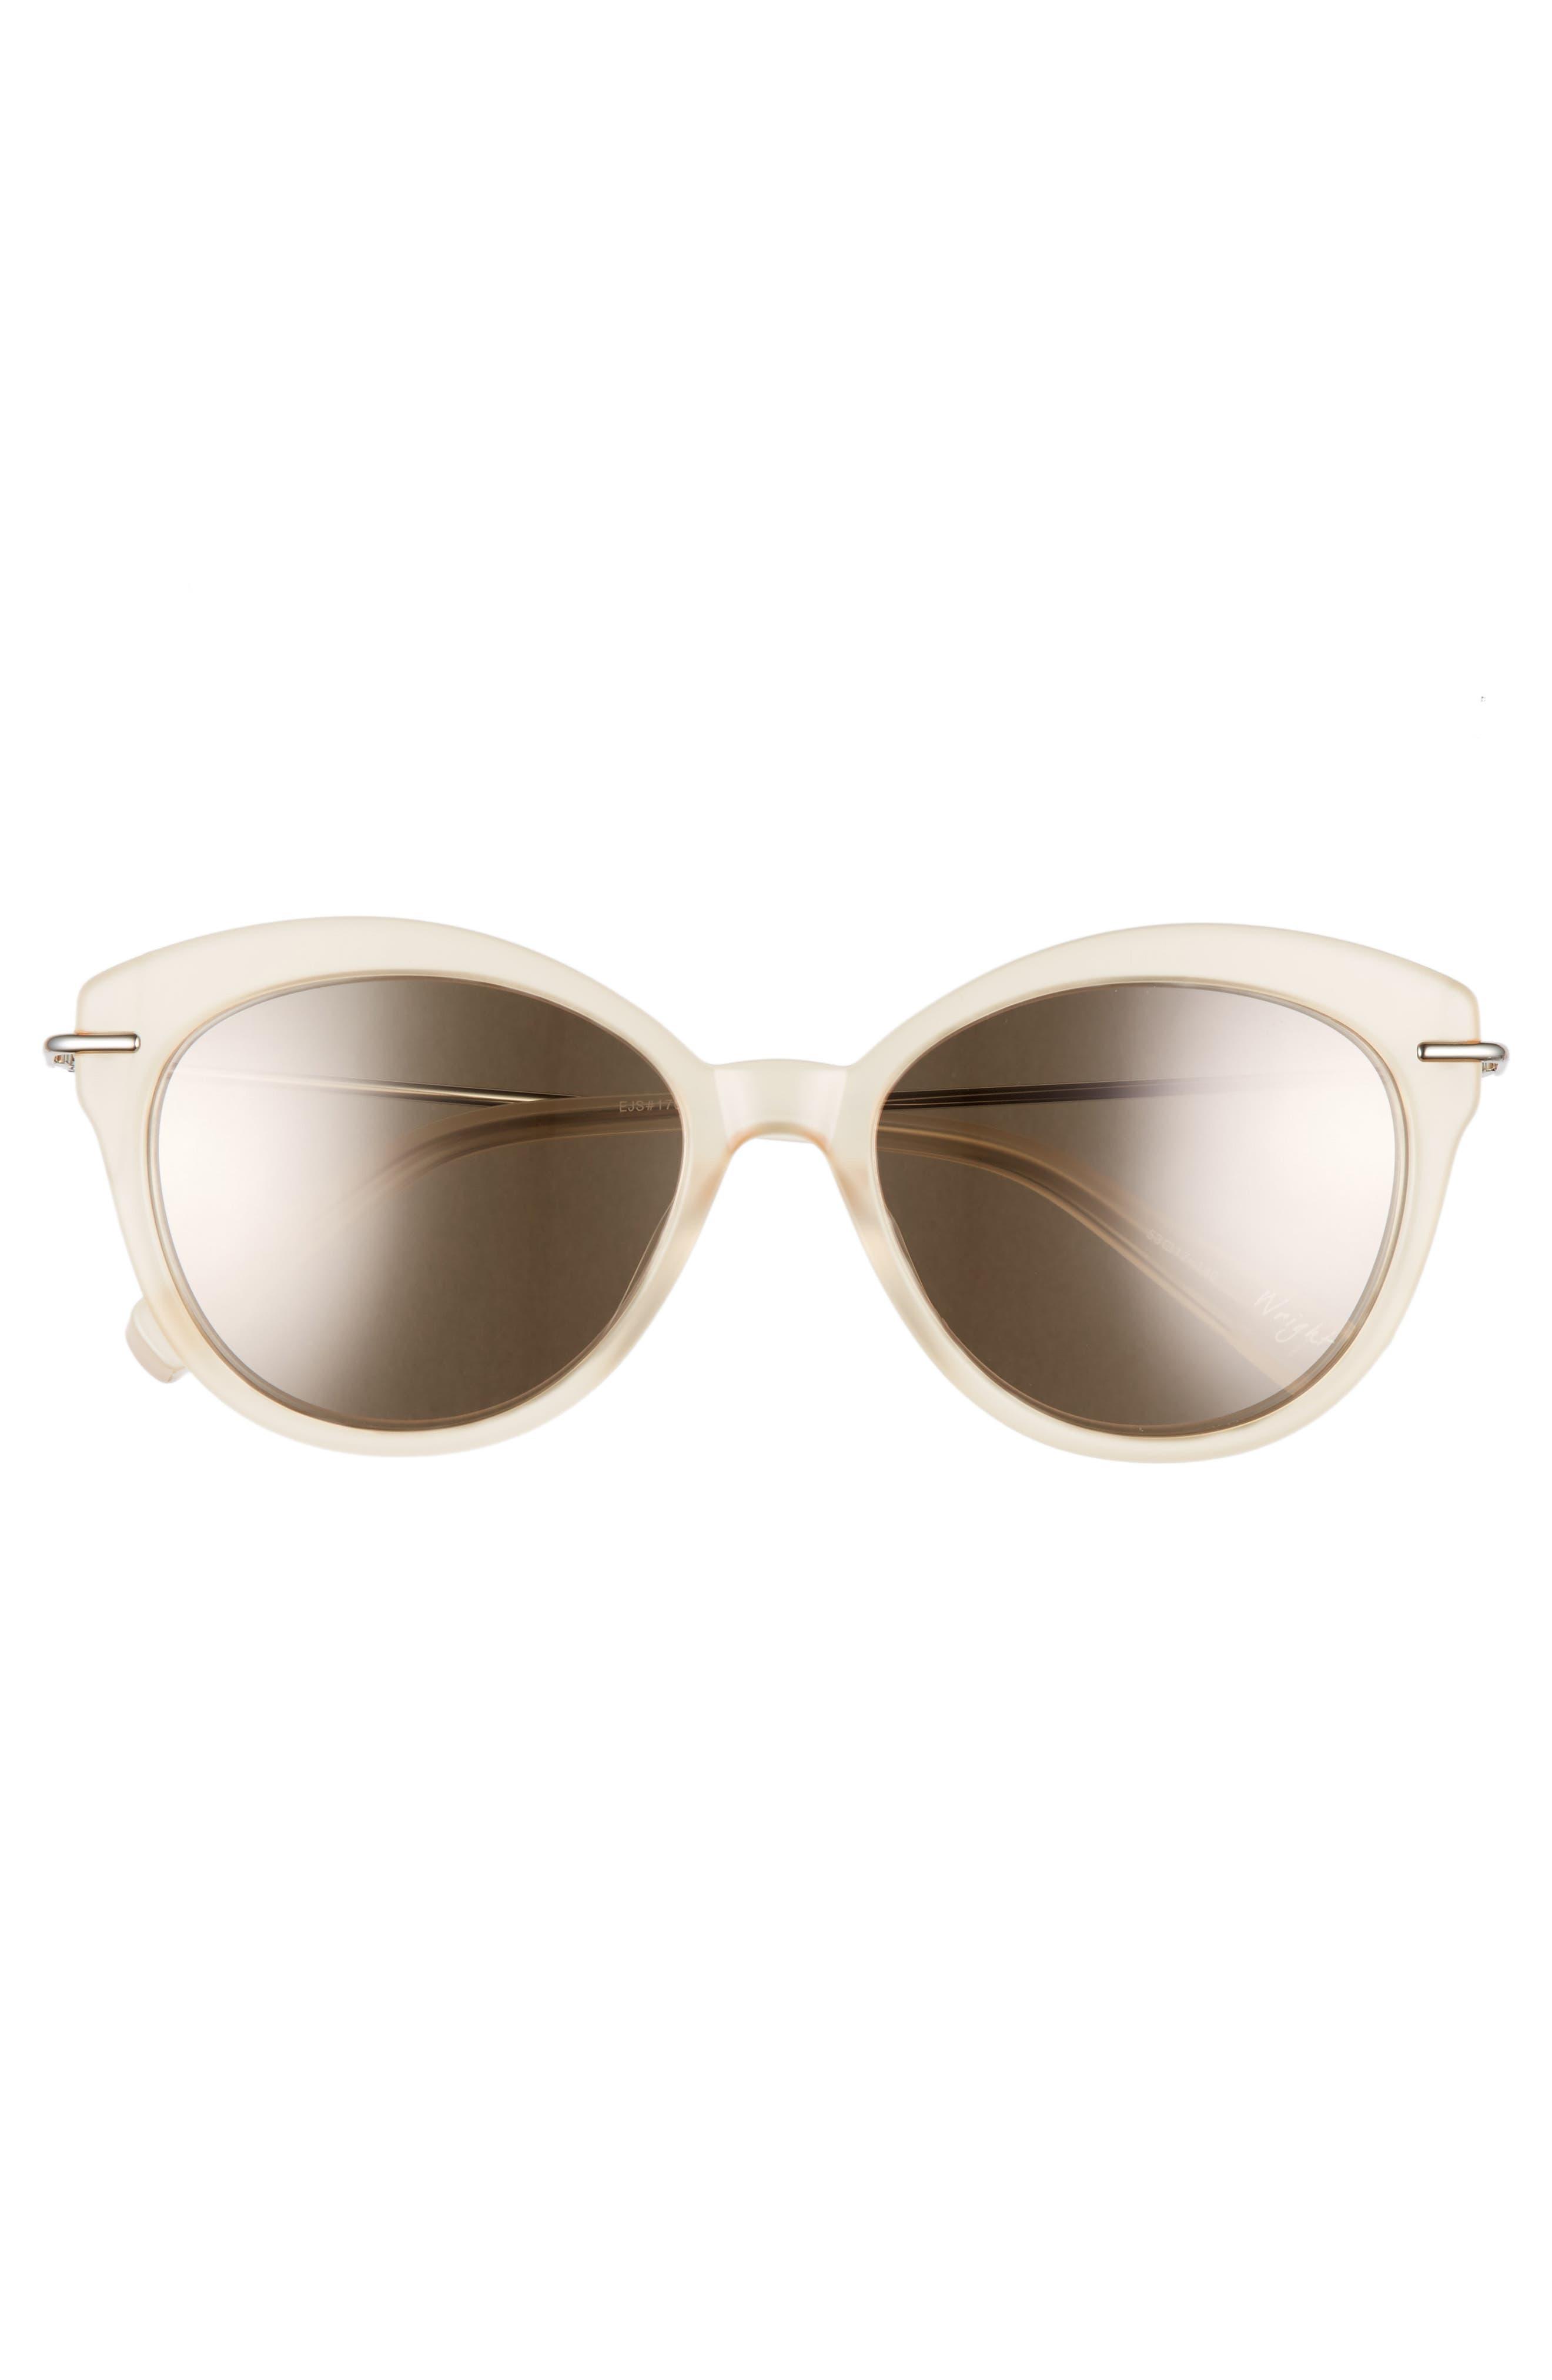 Wright 53mm Cat Eye Sunglasses,                             Alternate thumbnail 2, color,                             Lemon